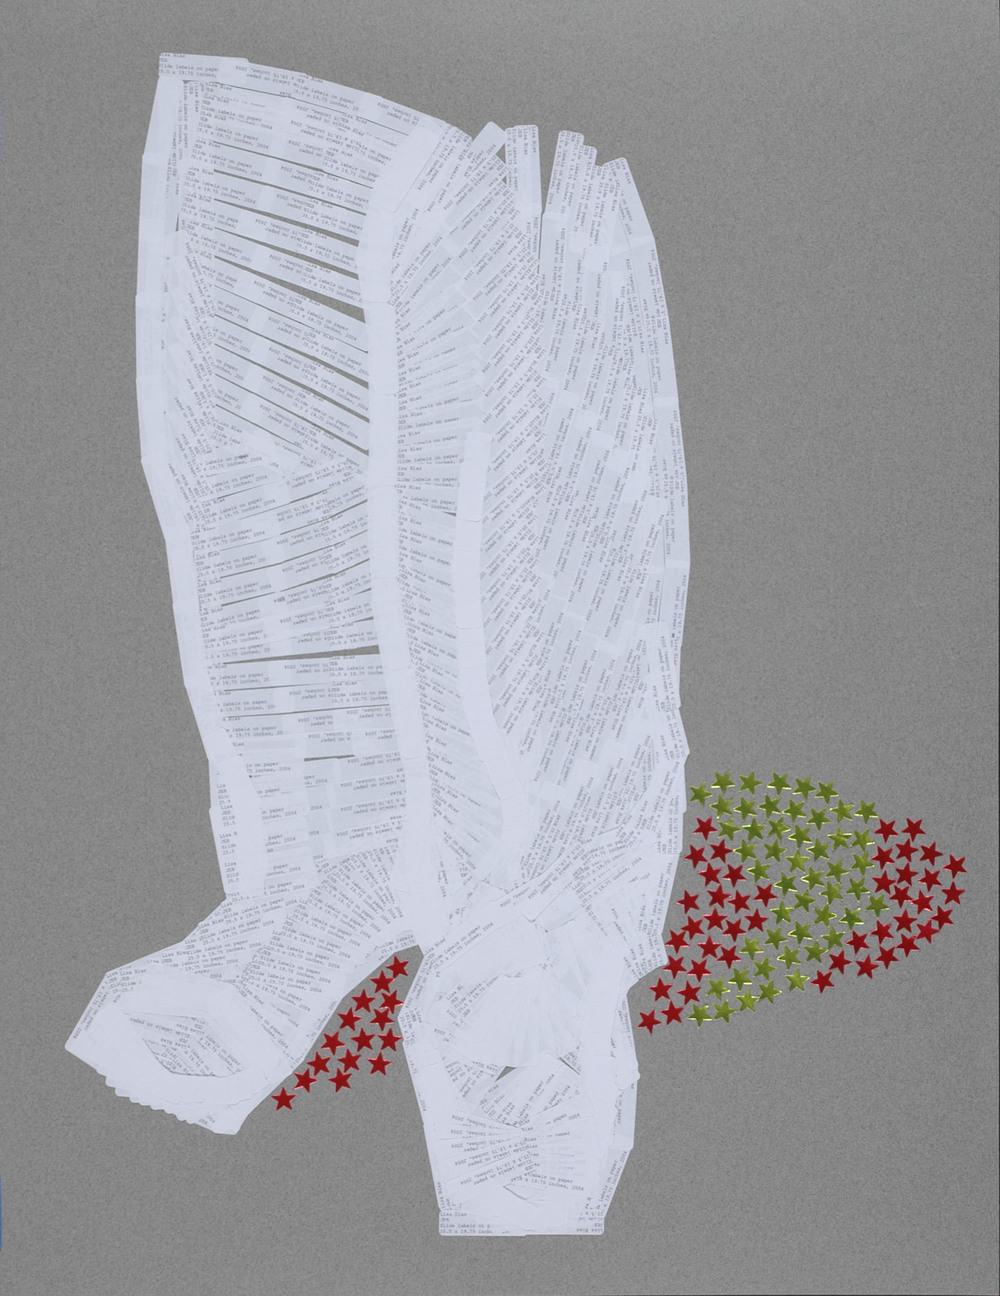 JEB  Chromogenic print 26 x 20 inches 2004